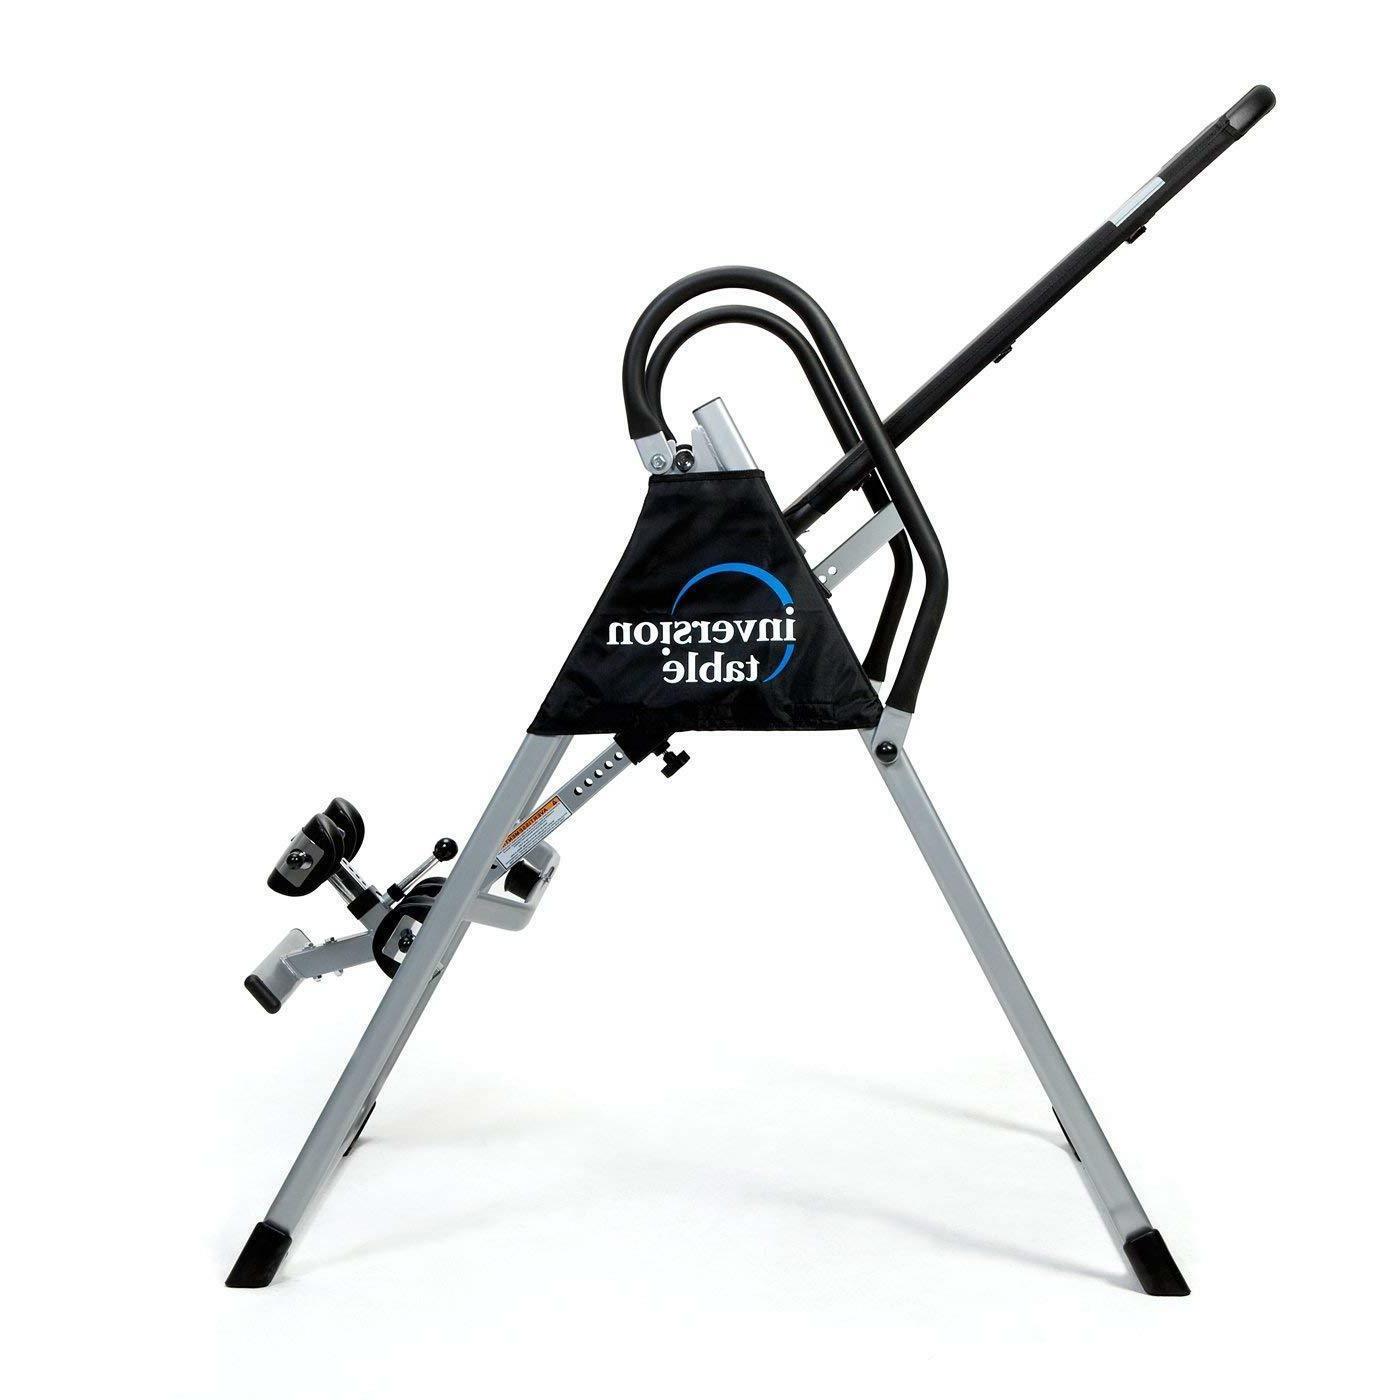 Ironman 5201 Gravity Inversion Table Fitness Heavy